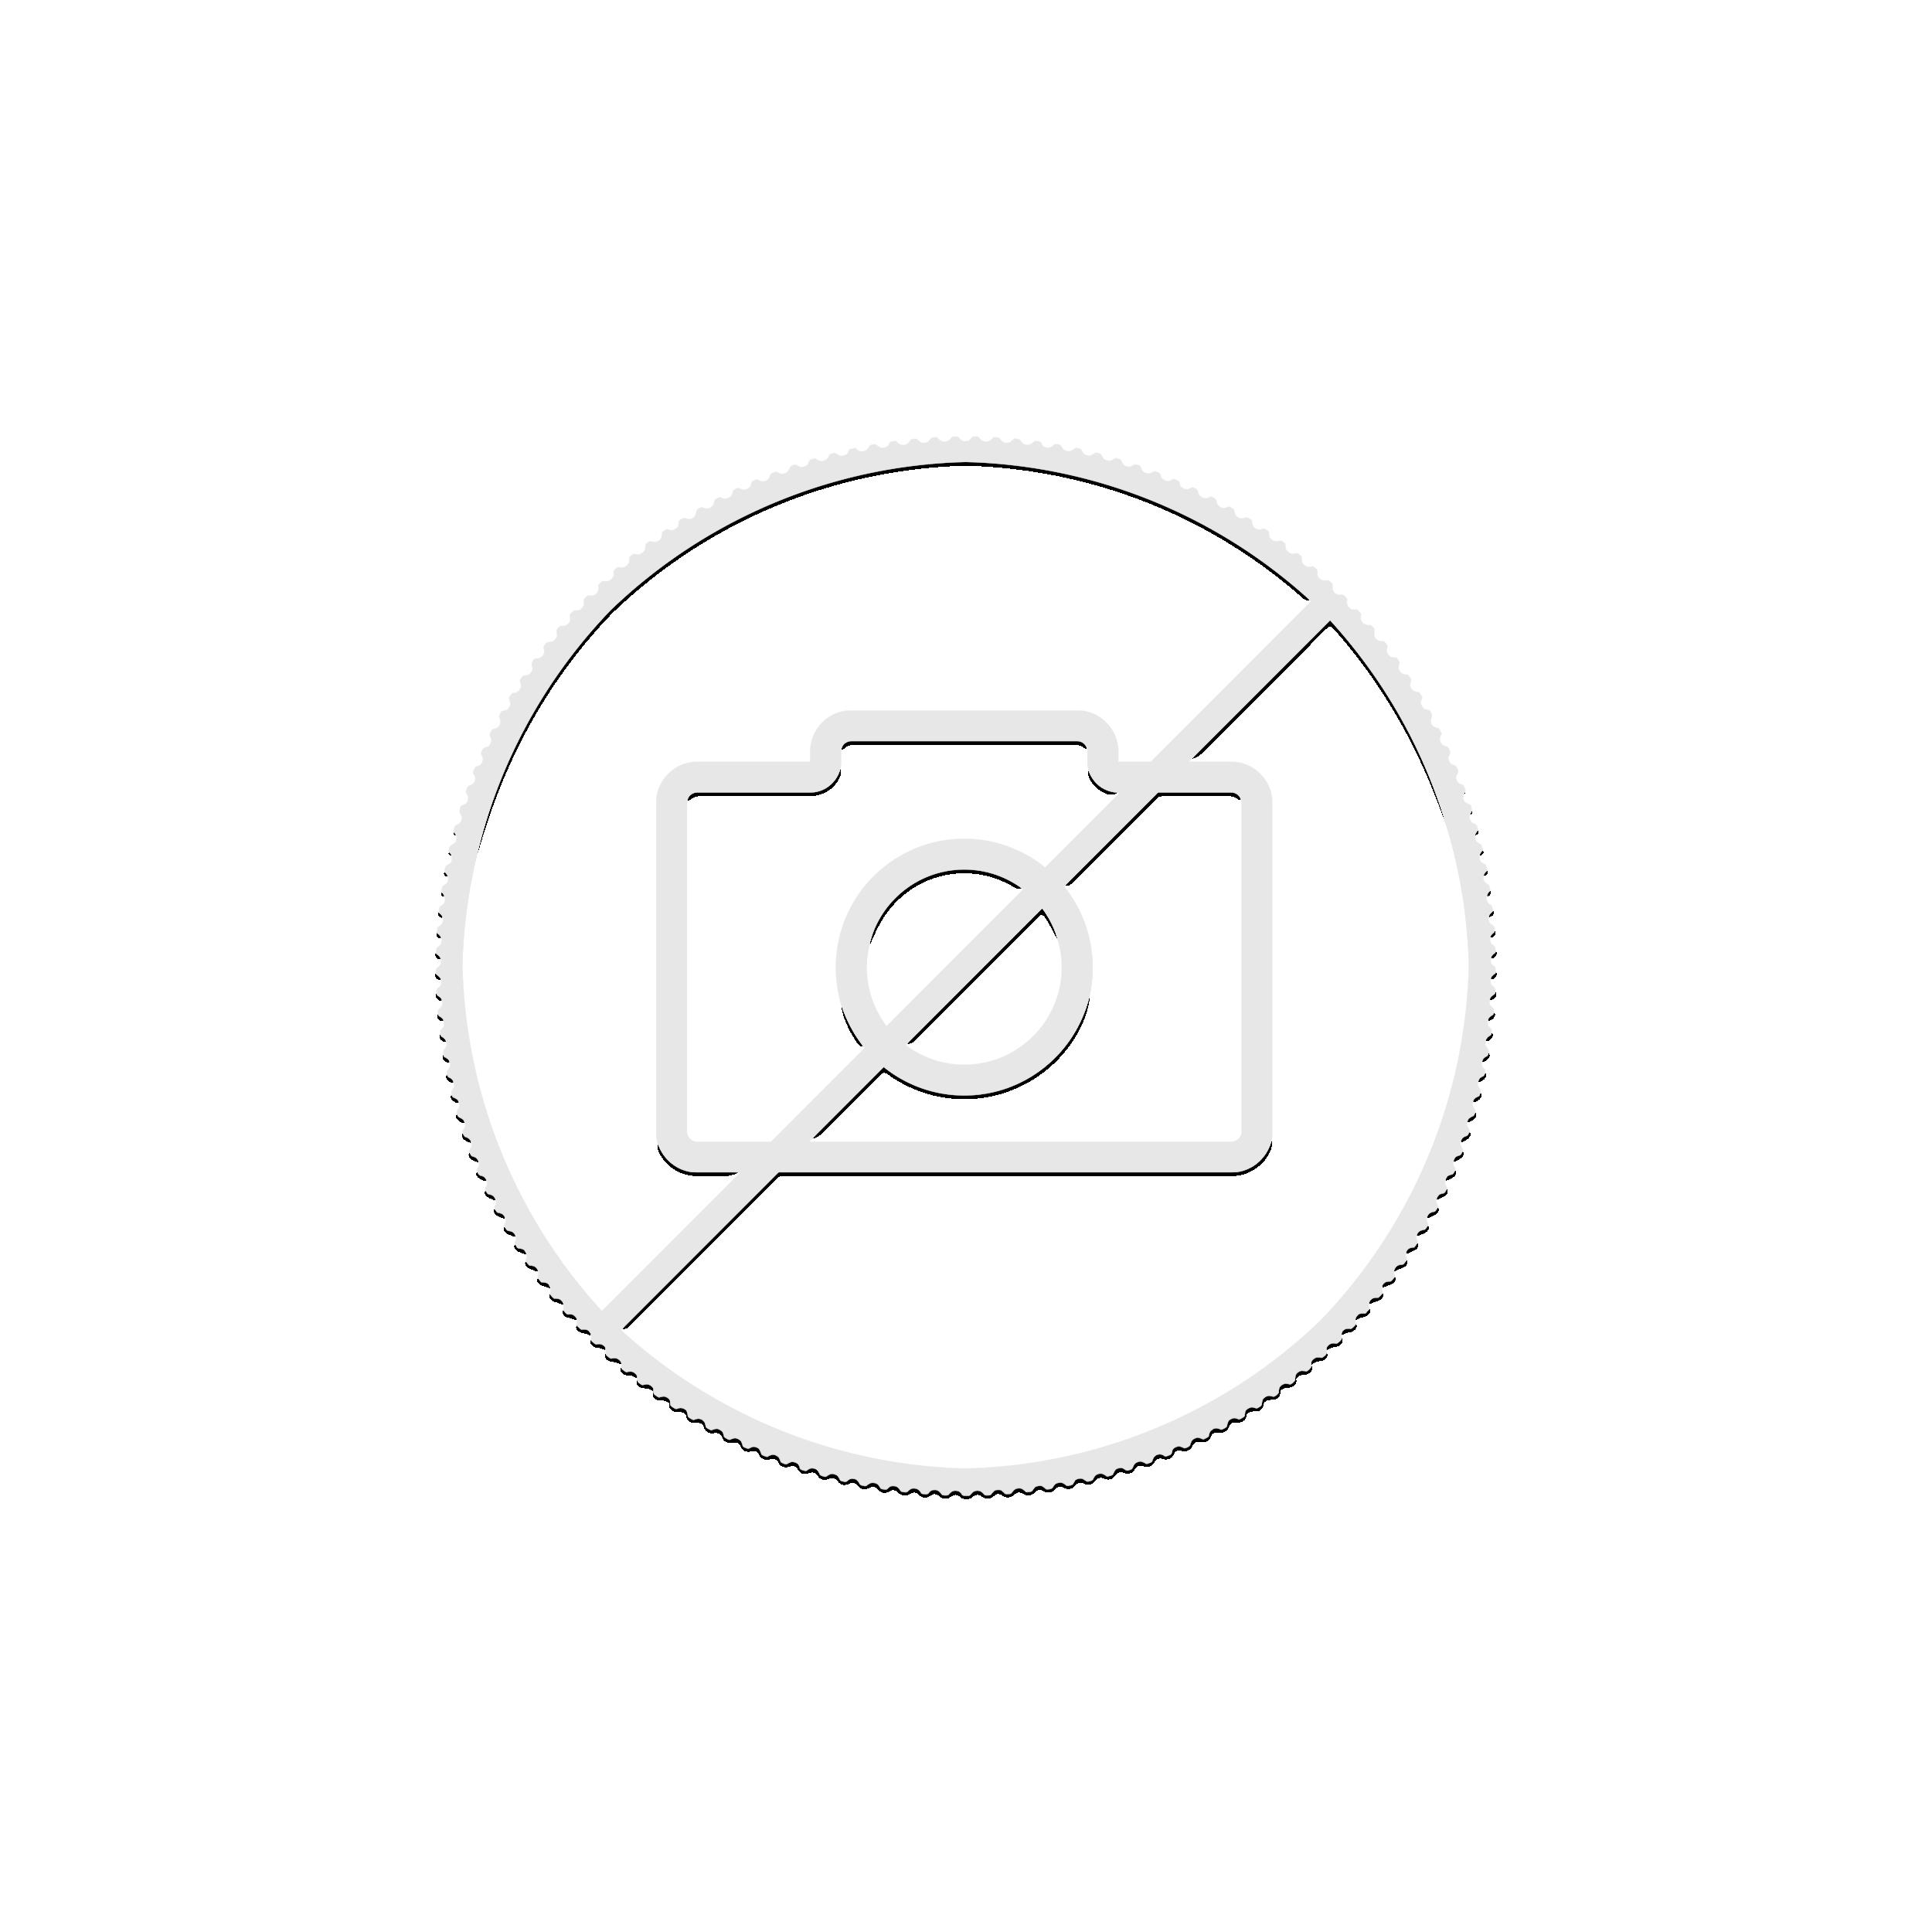 2 troy ounce zilveren munt Platypus Next Generations 2021 - achterkant